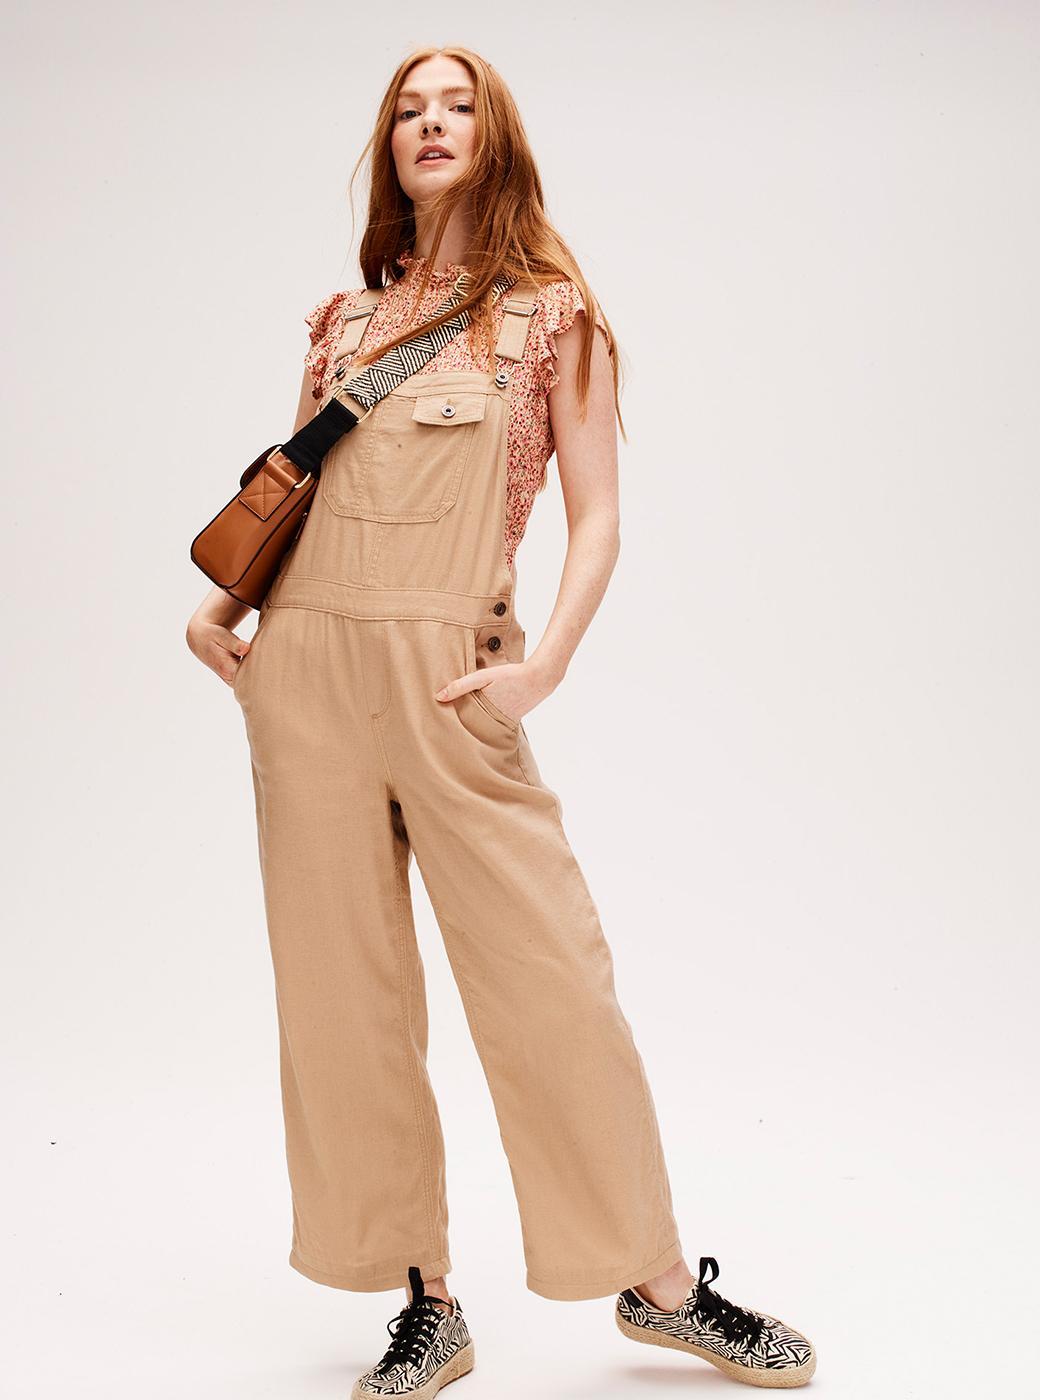 Women's Clothing   Women's Fashion Online   Argos